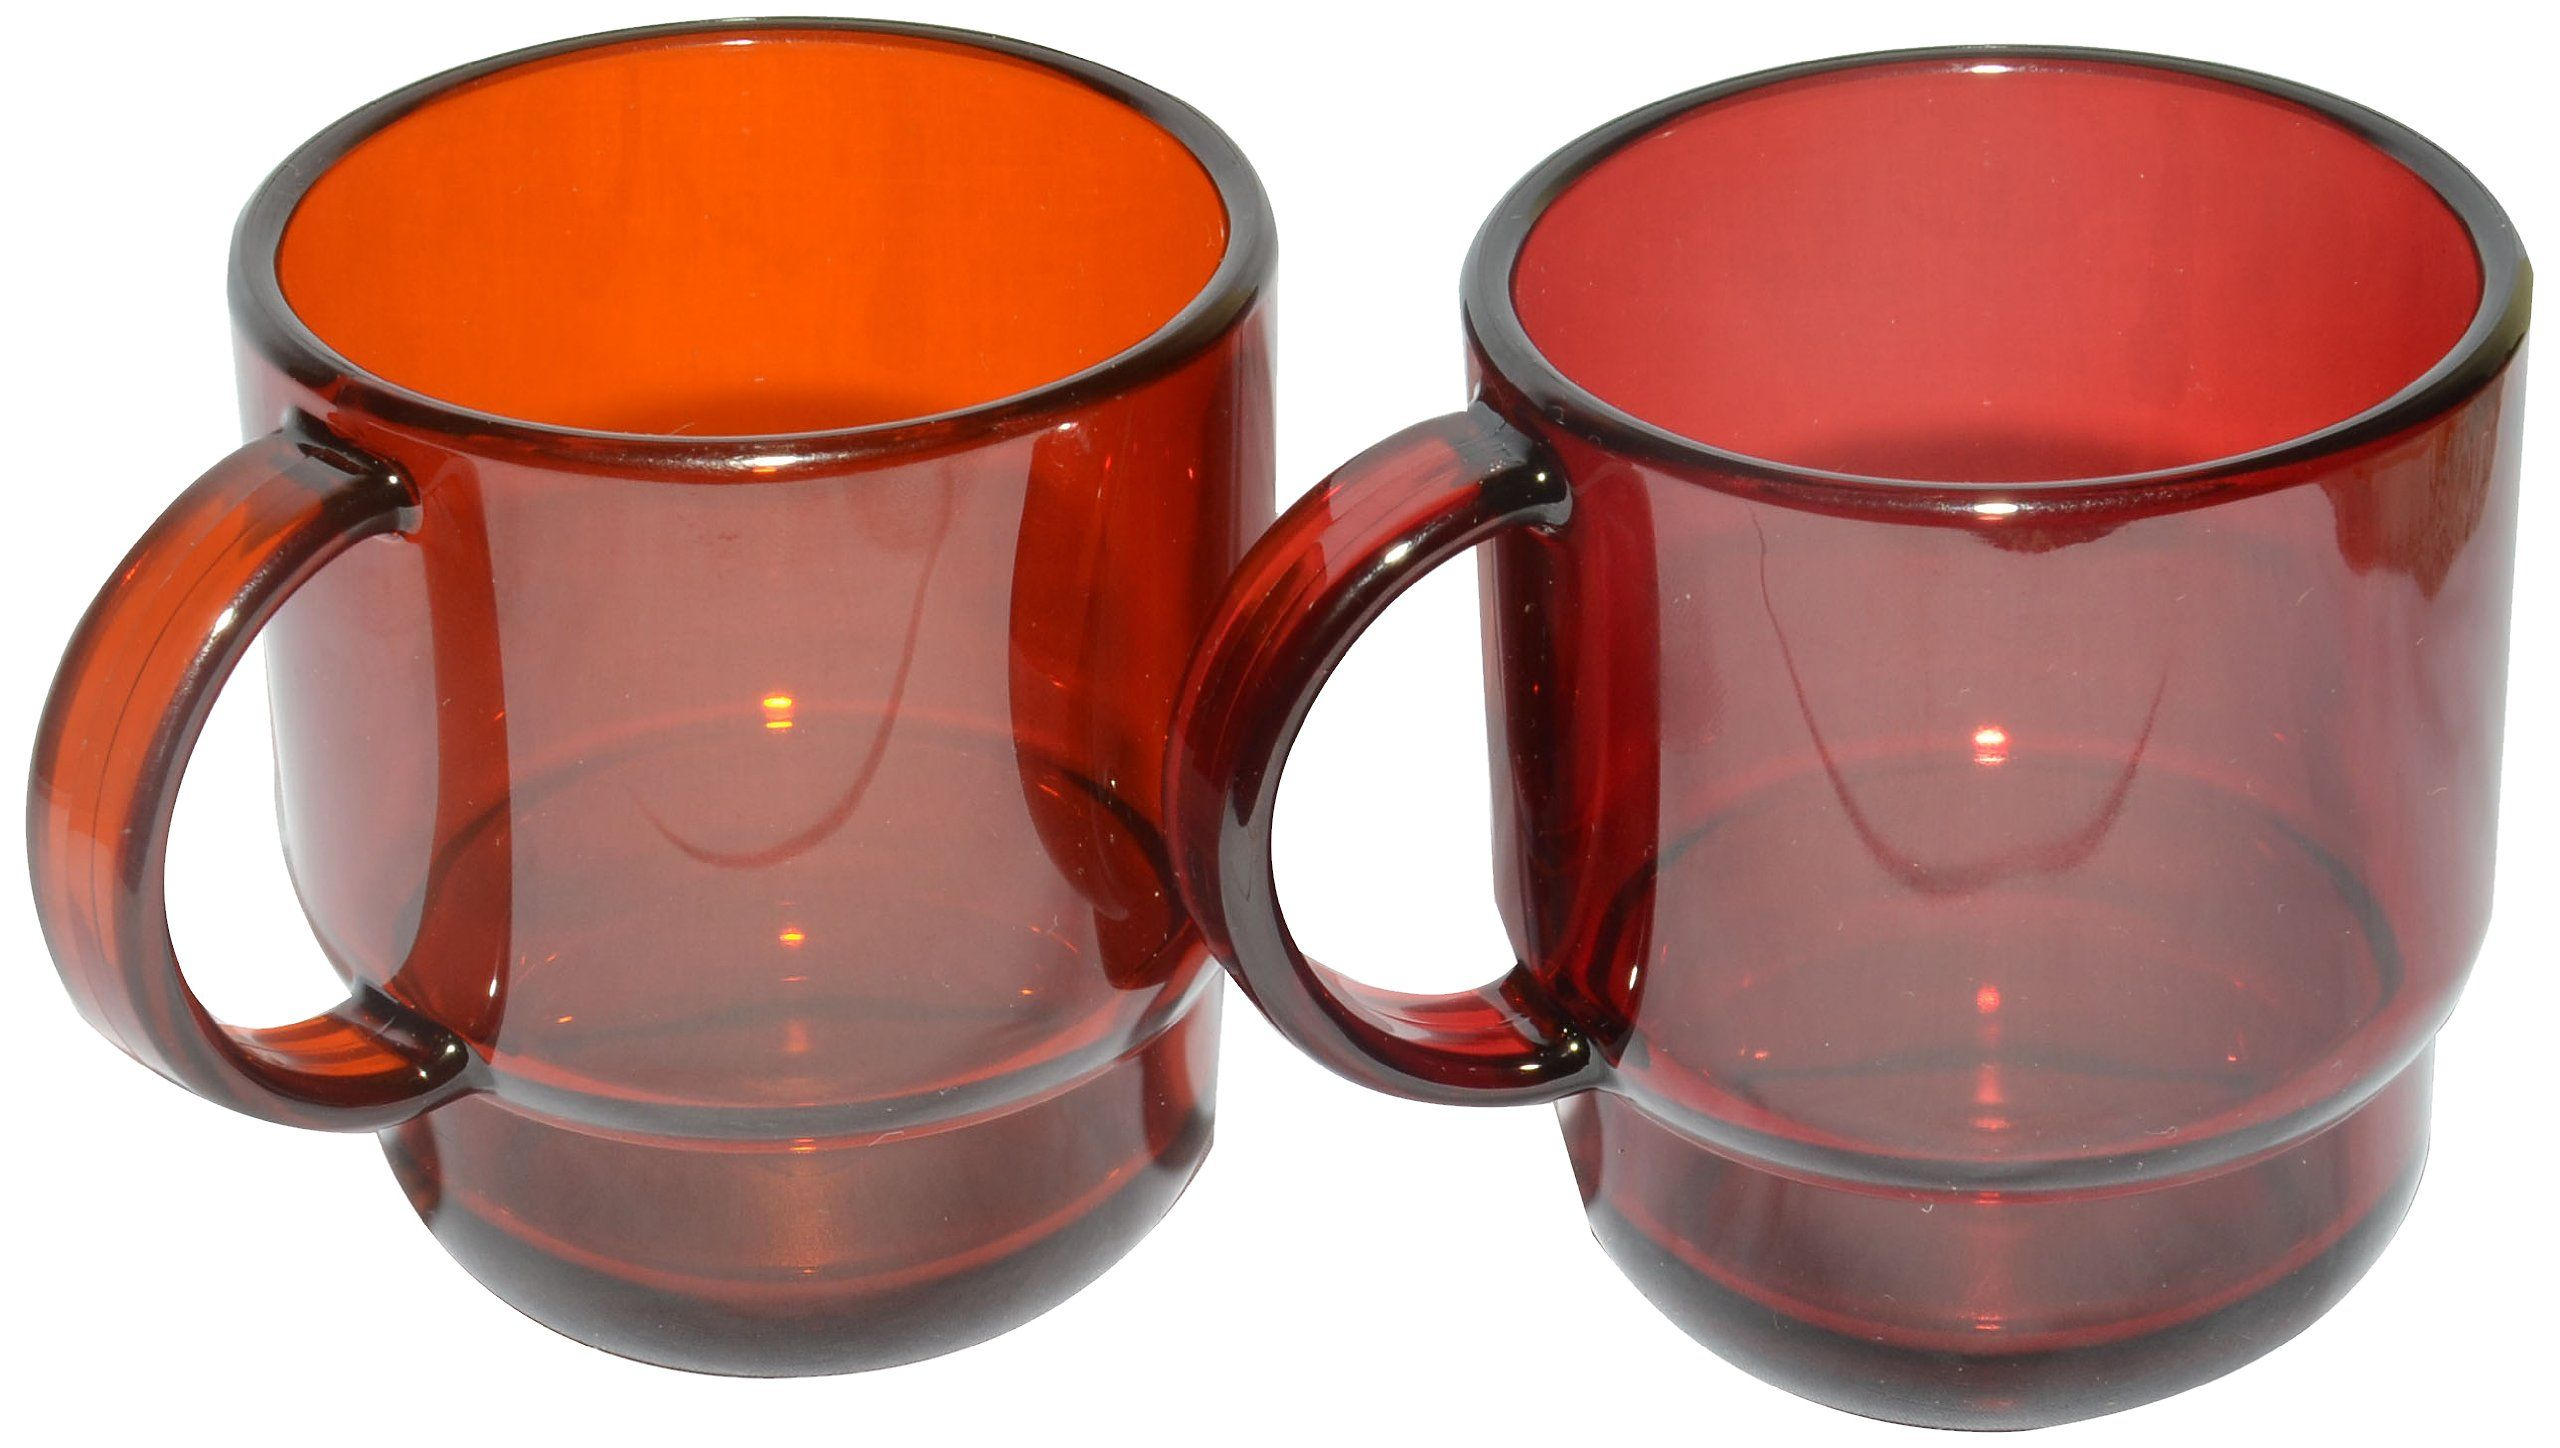 Buy Tupperware PC Coffee Mug Set, Set of 2, Brown